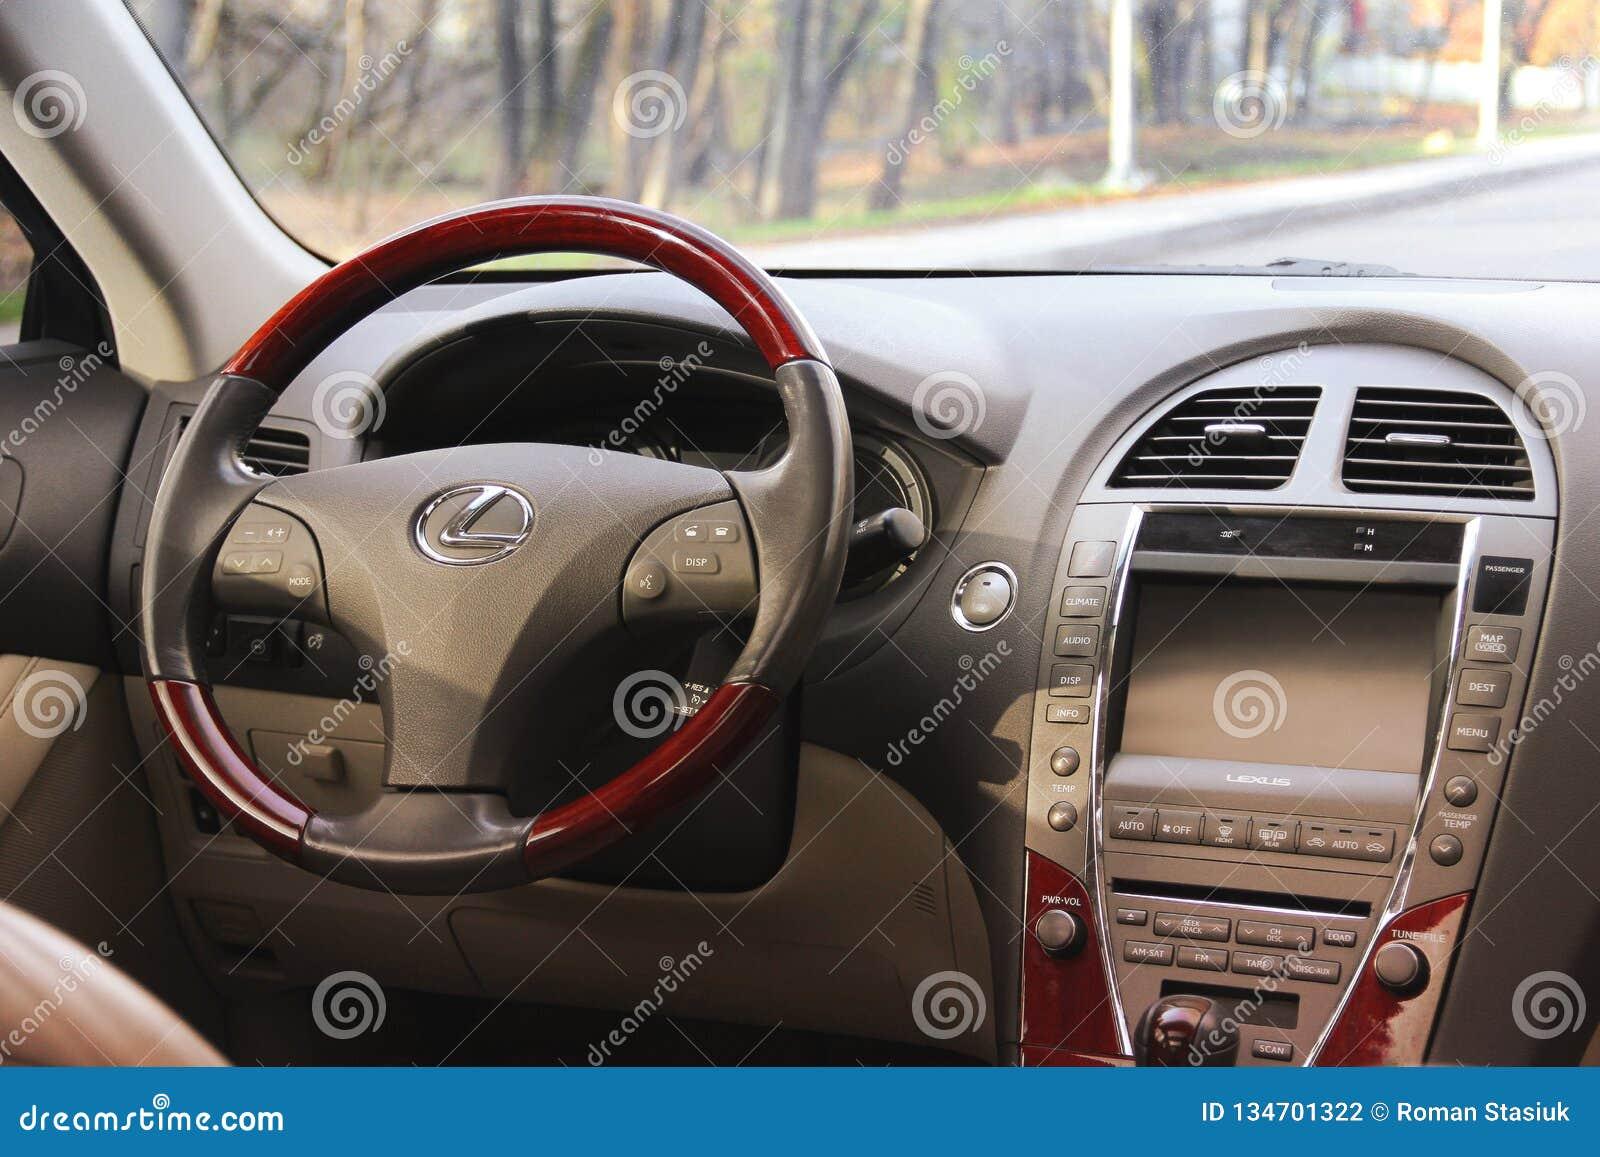 Kiev Ukraine November 5 2018 Lexus Car Interior Car Dashboard